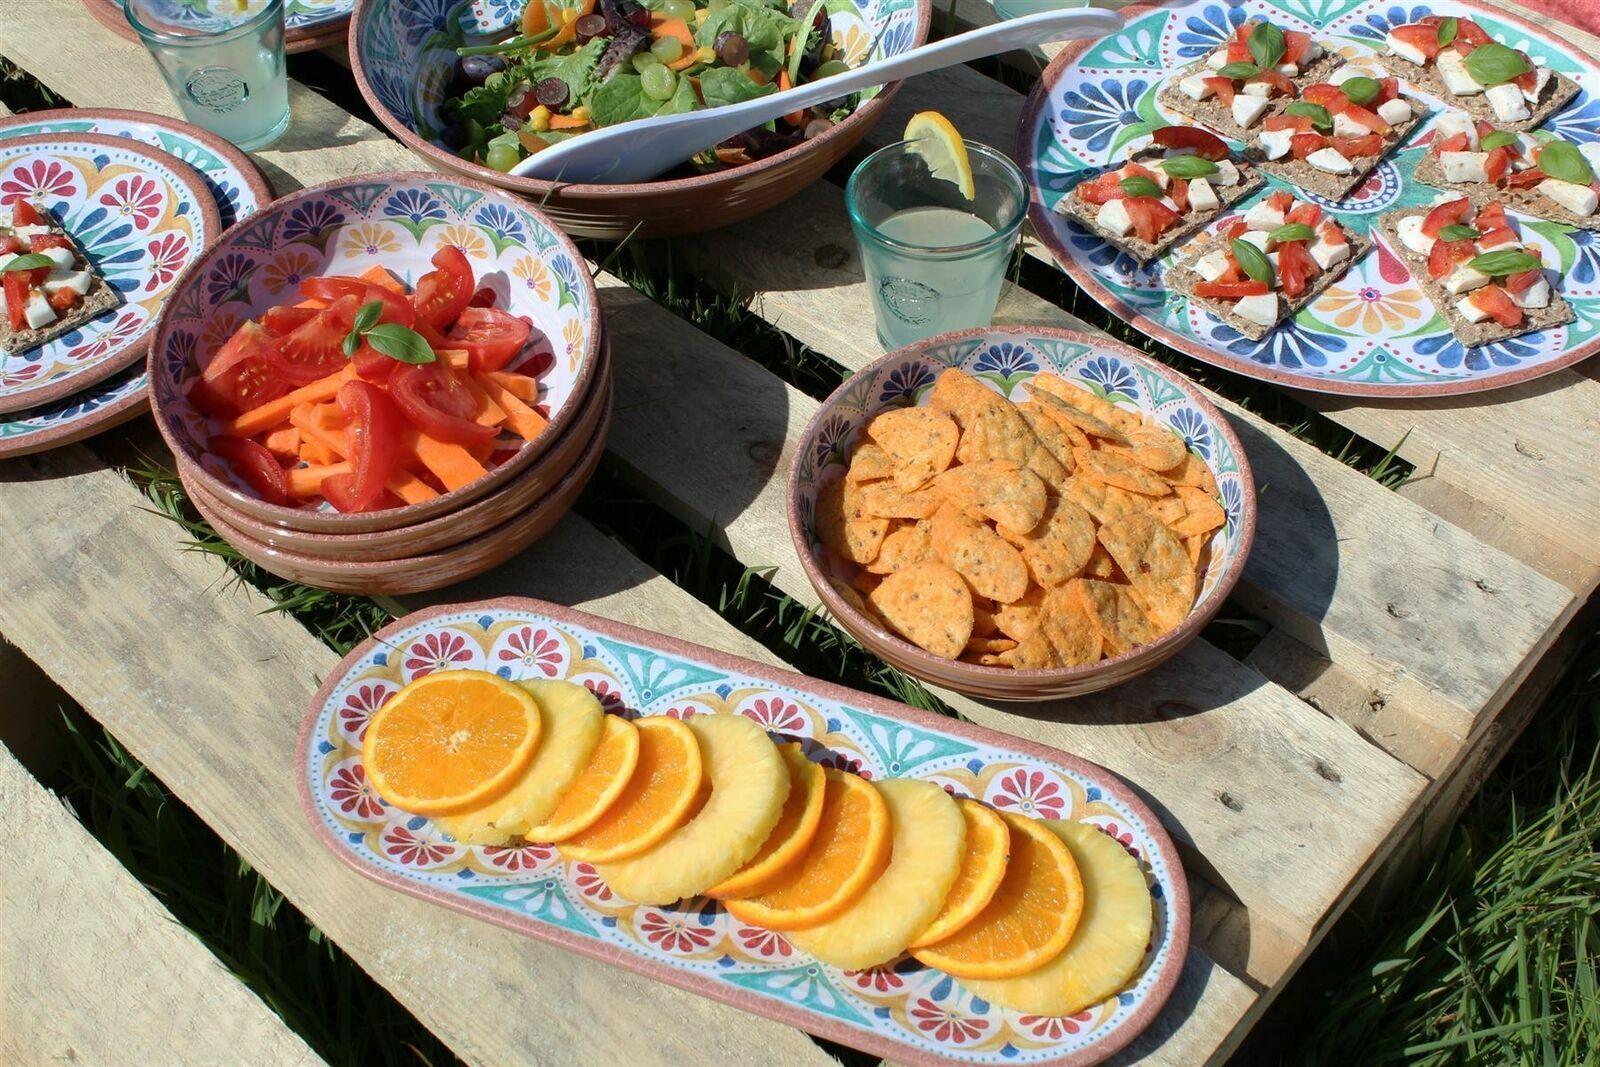 Epicurean Set of 2 Rio Corte Melamine Low Bowls Serving Party Summer Camping